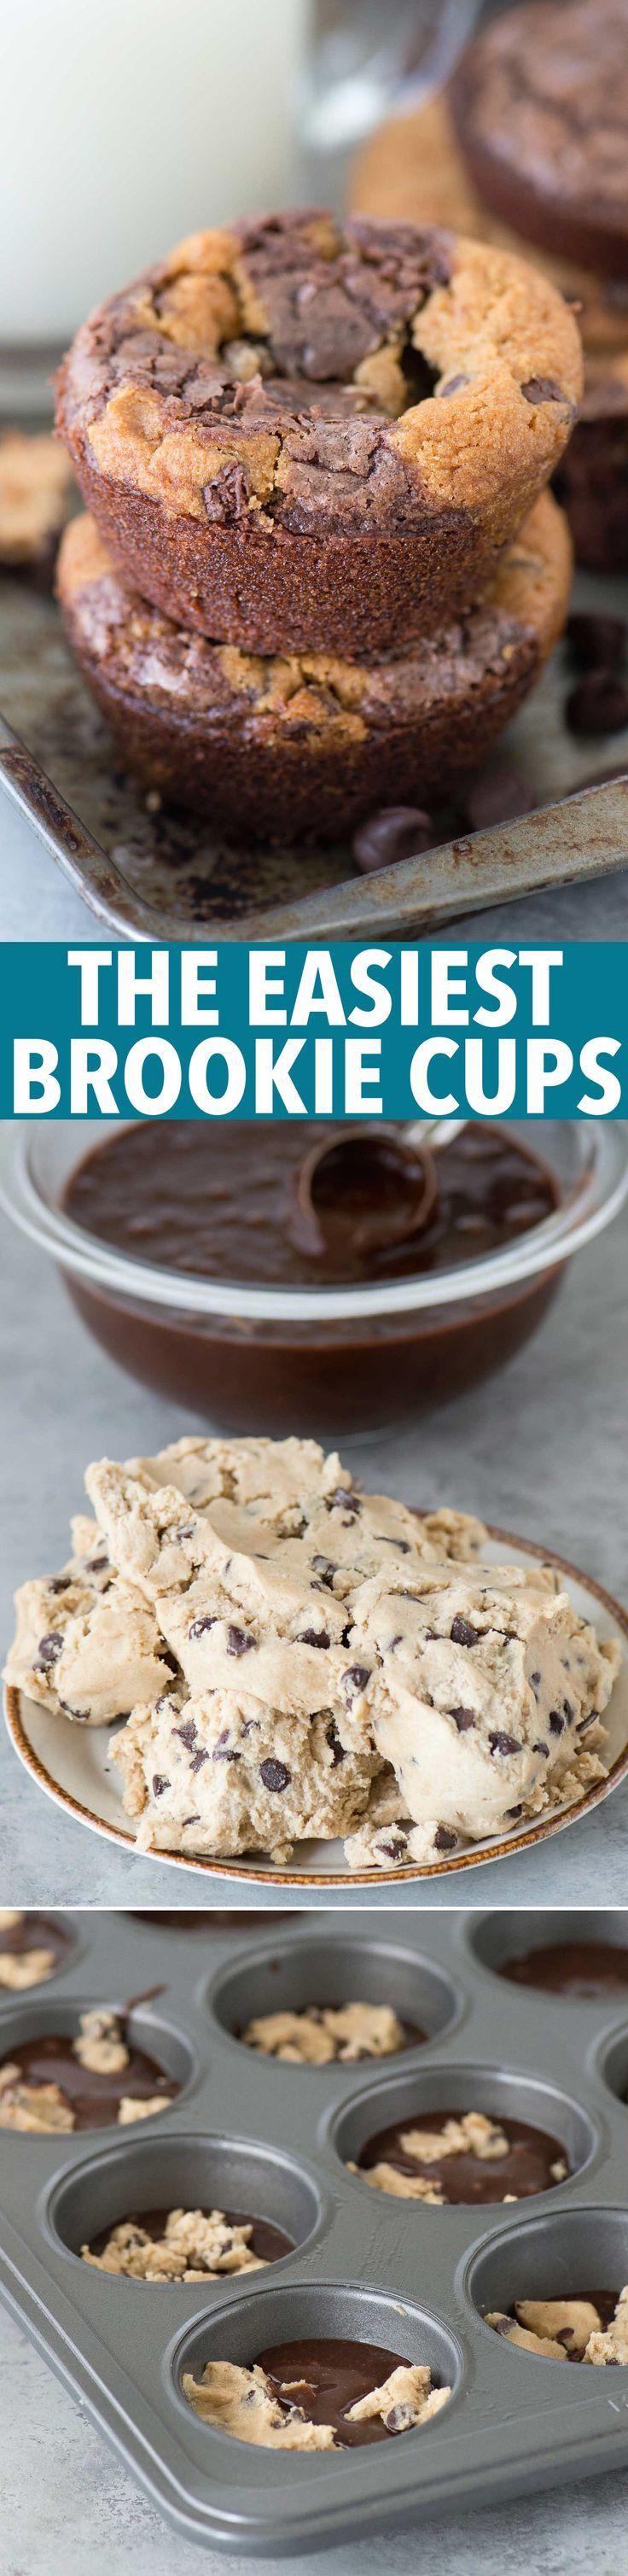 Brookie Cups